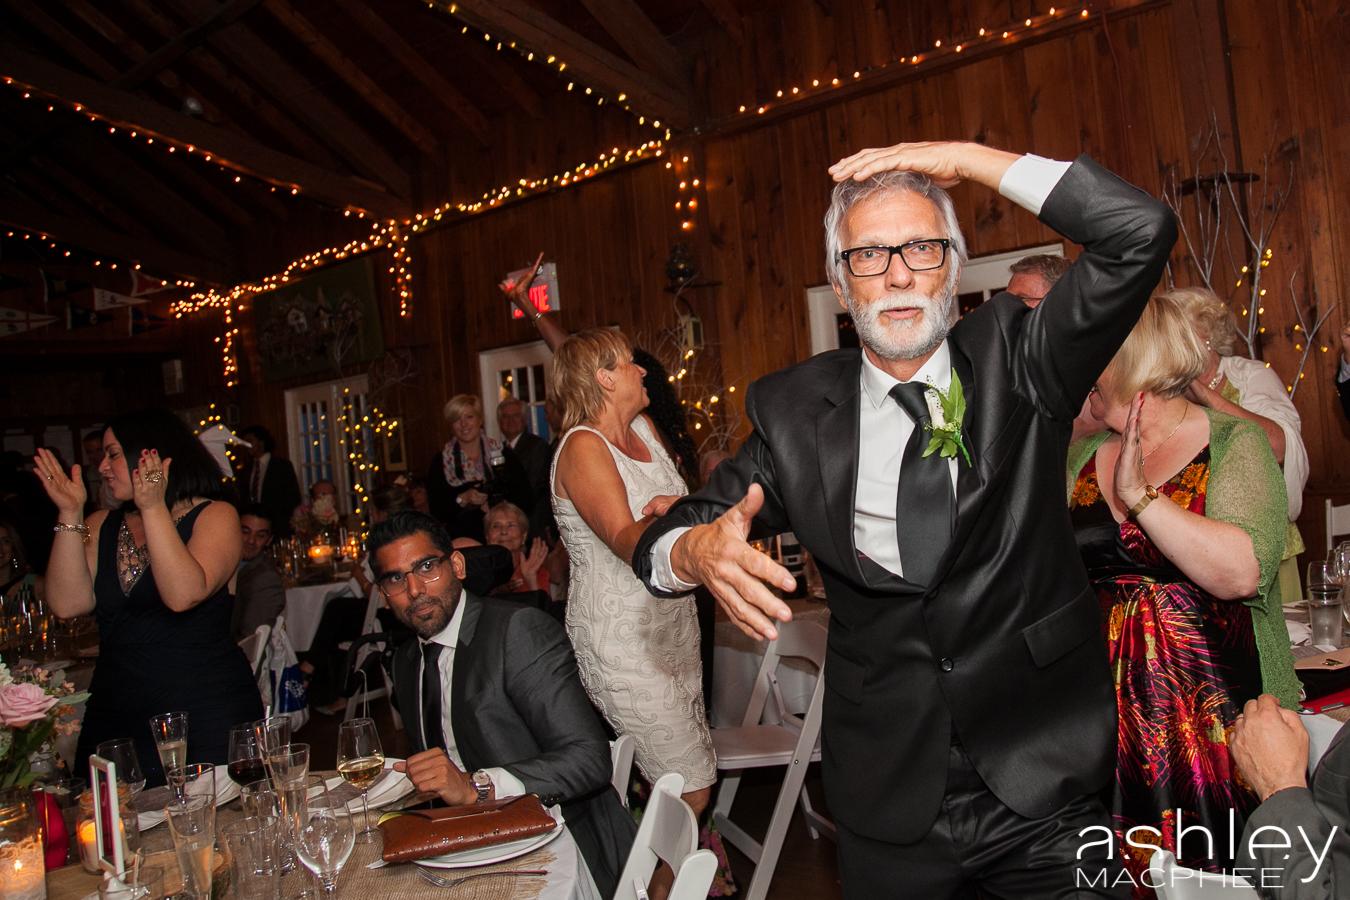 Ashley MacPhee Photography Hudson Yacht Club wedding photographer (82 of 112).jpg